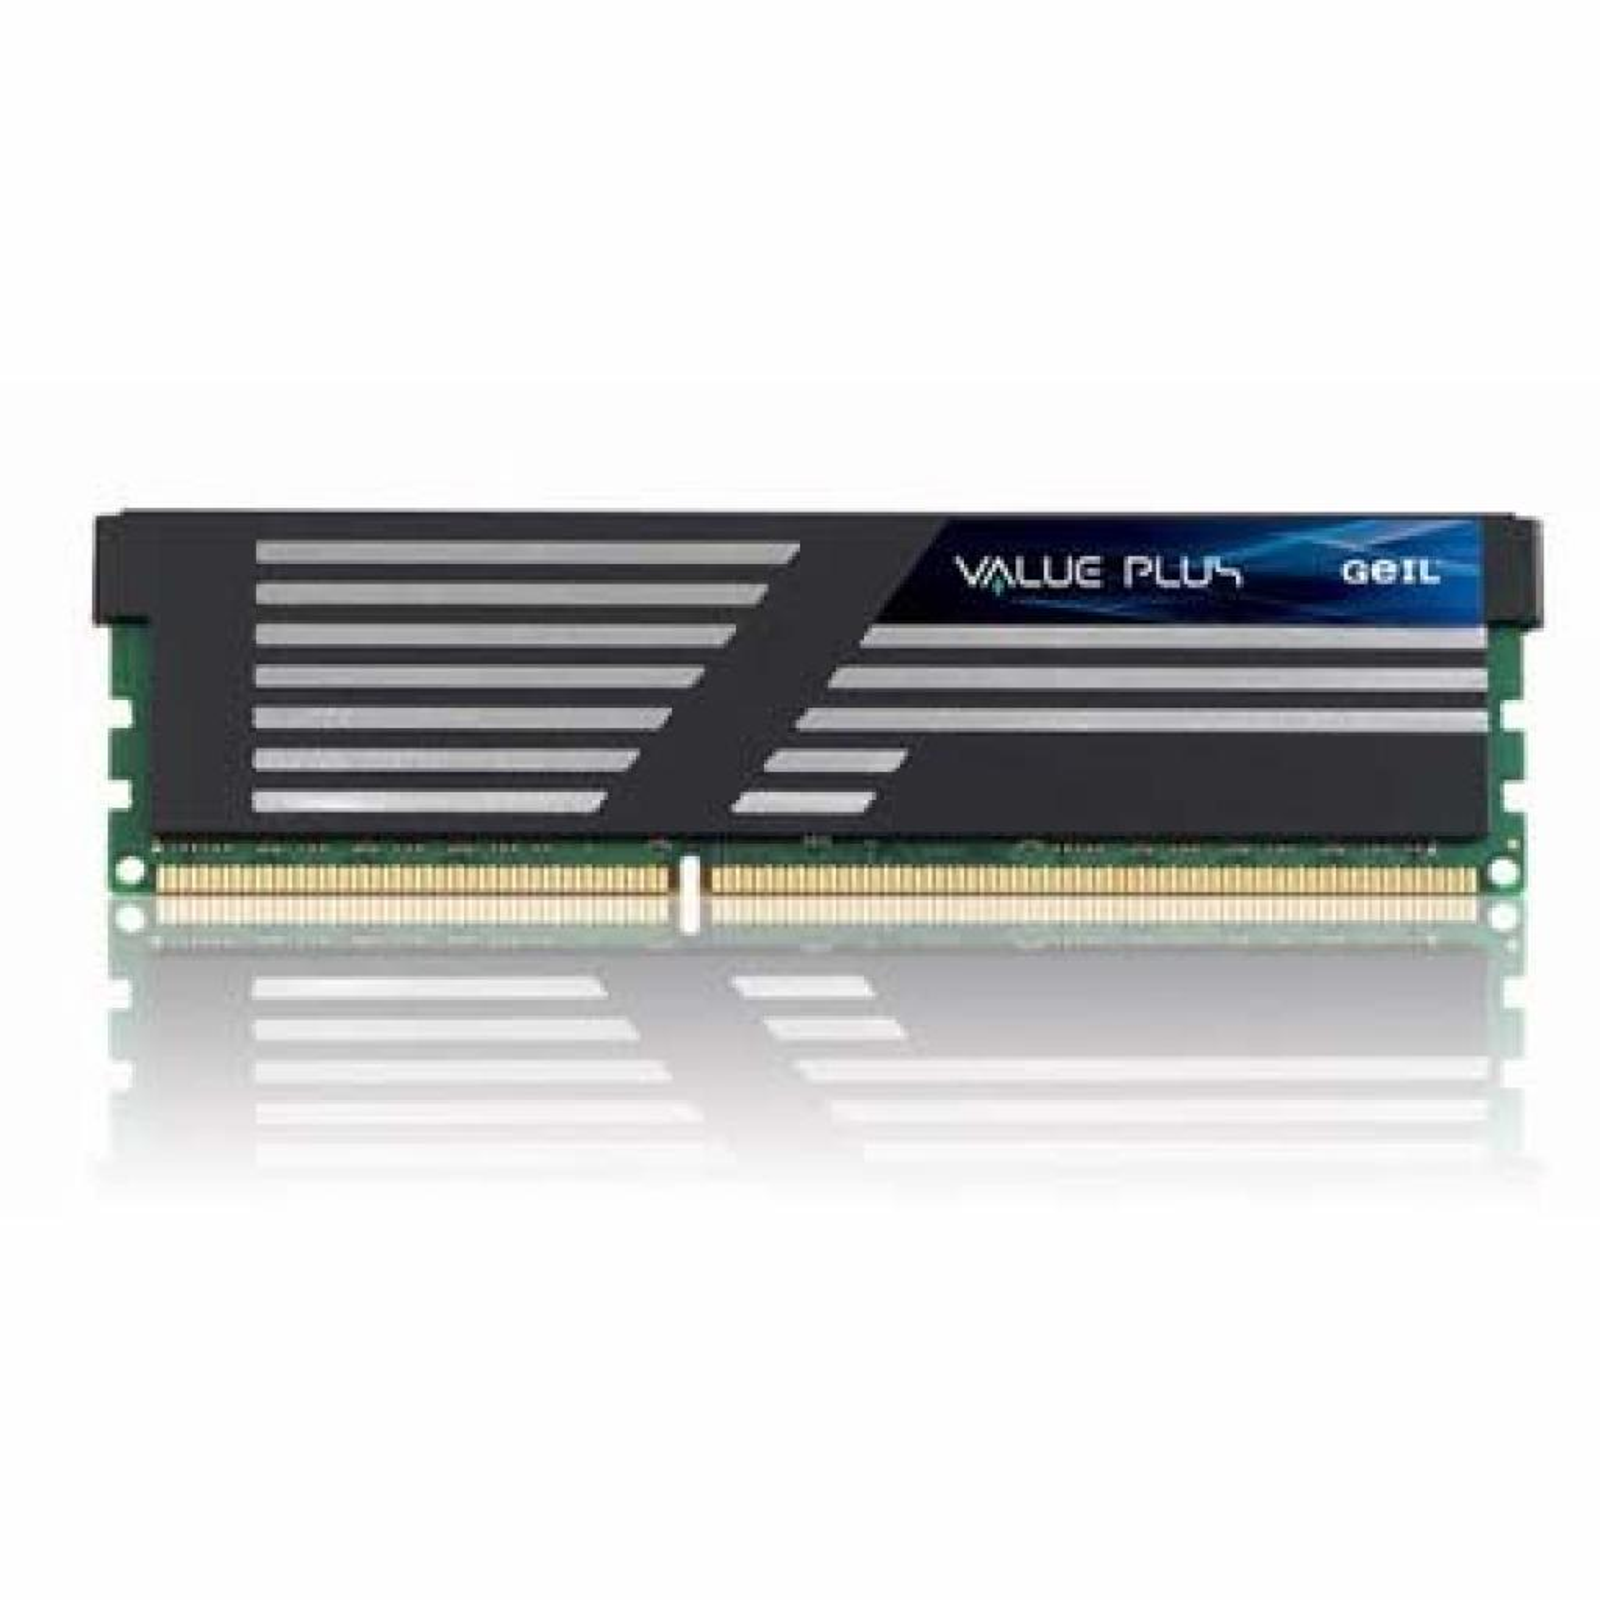 Модуль памяти для компьютера DDR3 2GB 1333 MHz GEIL (GVP32GB1333C9SC / GVP32GB1333C9SCN)